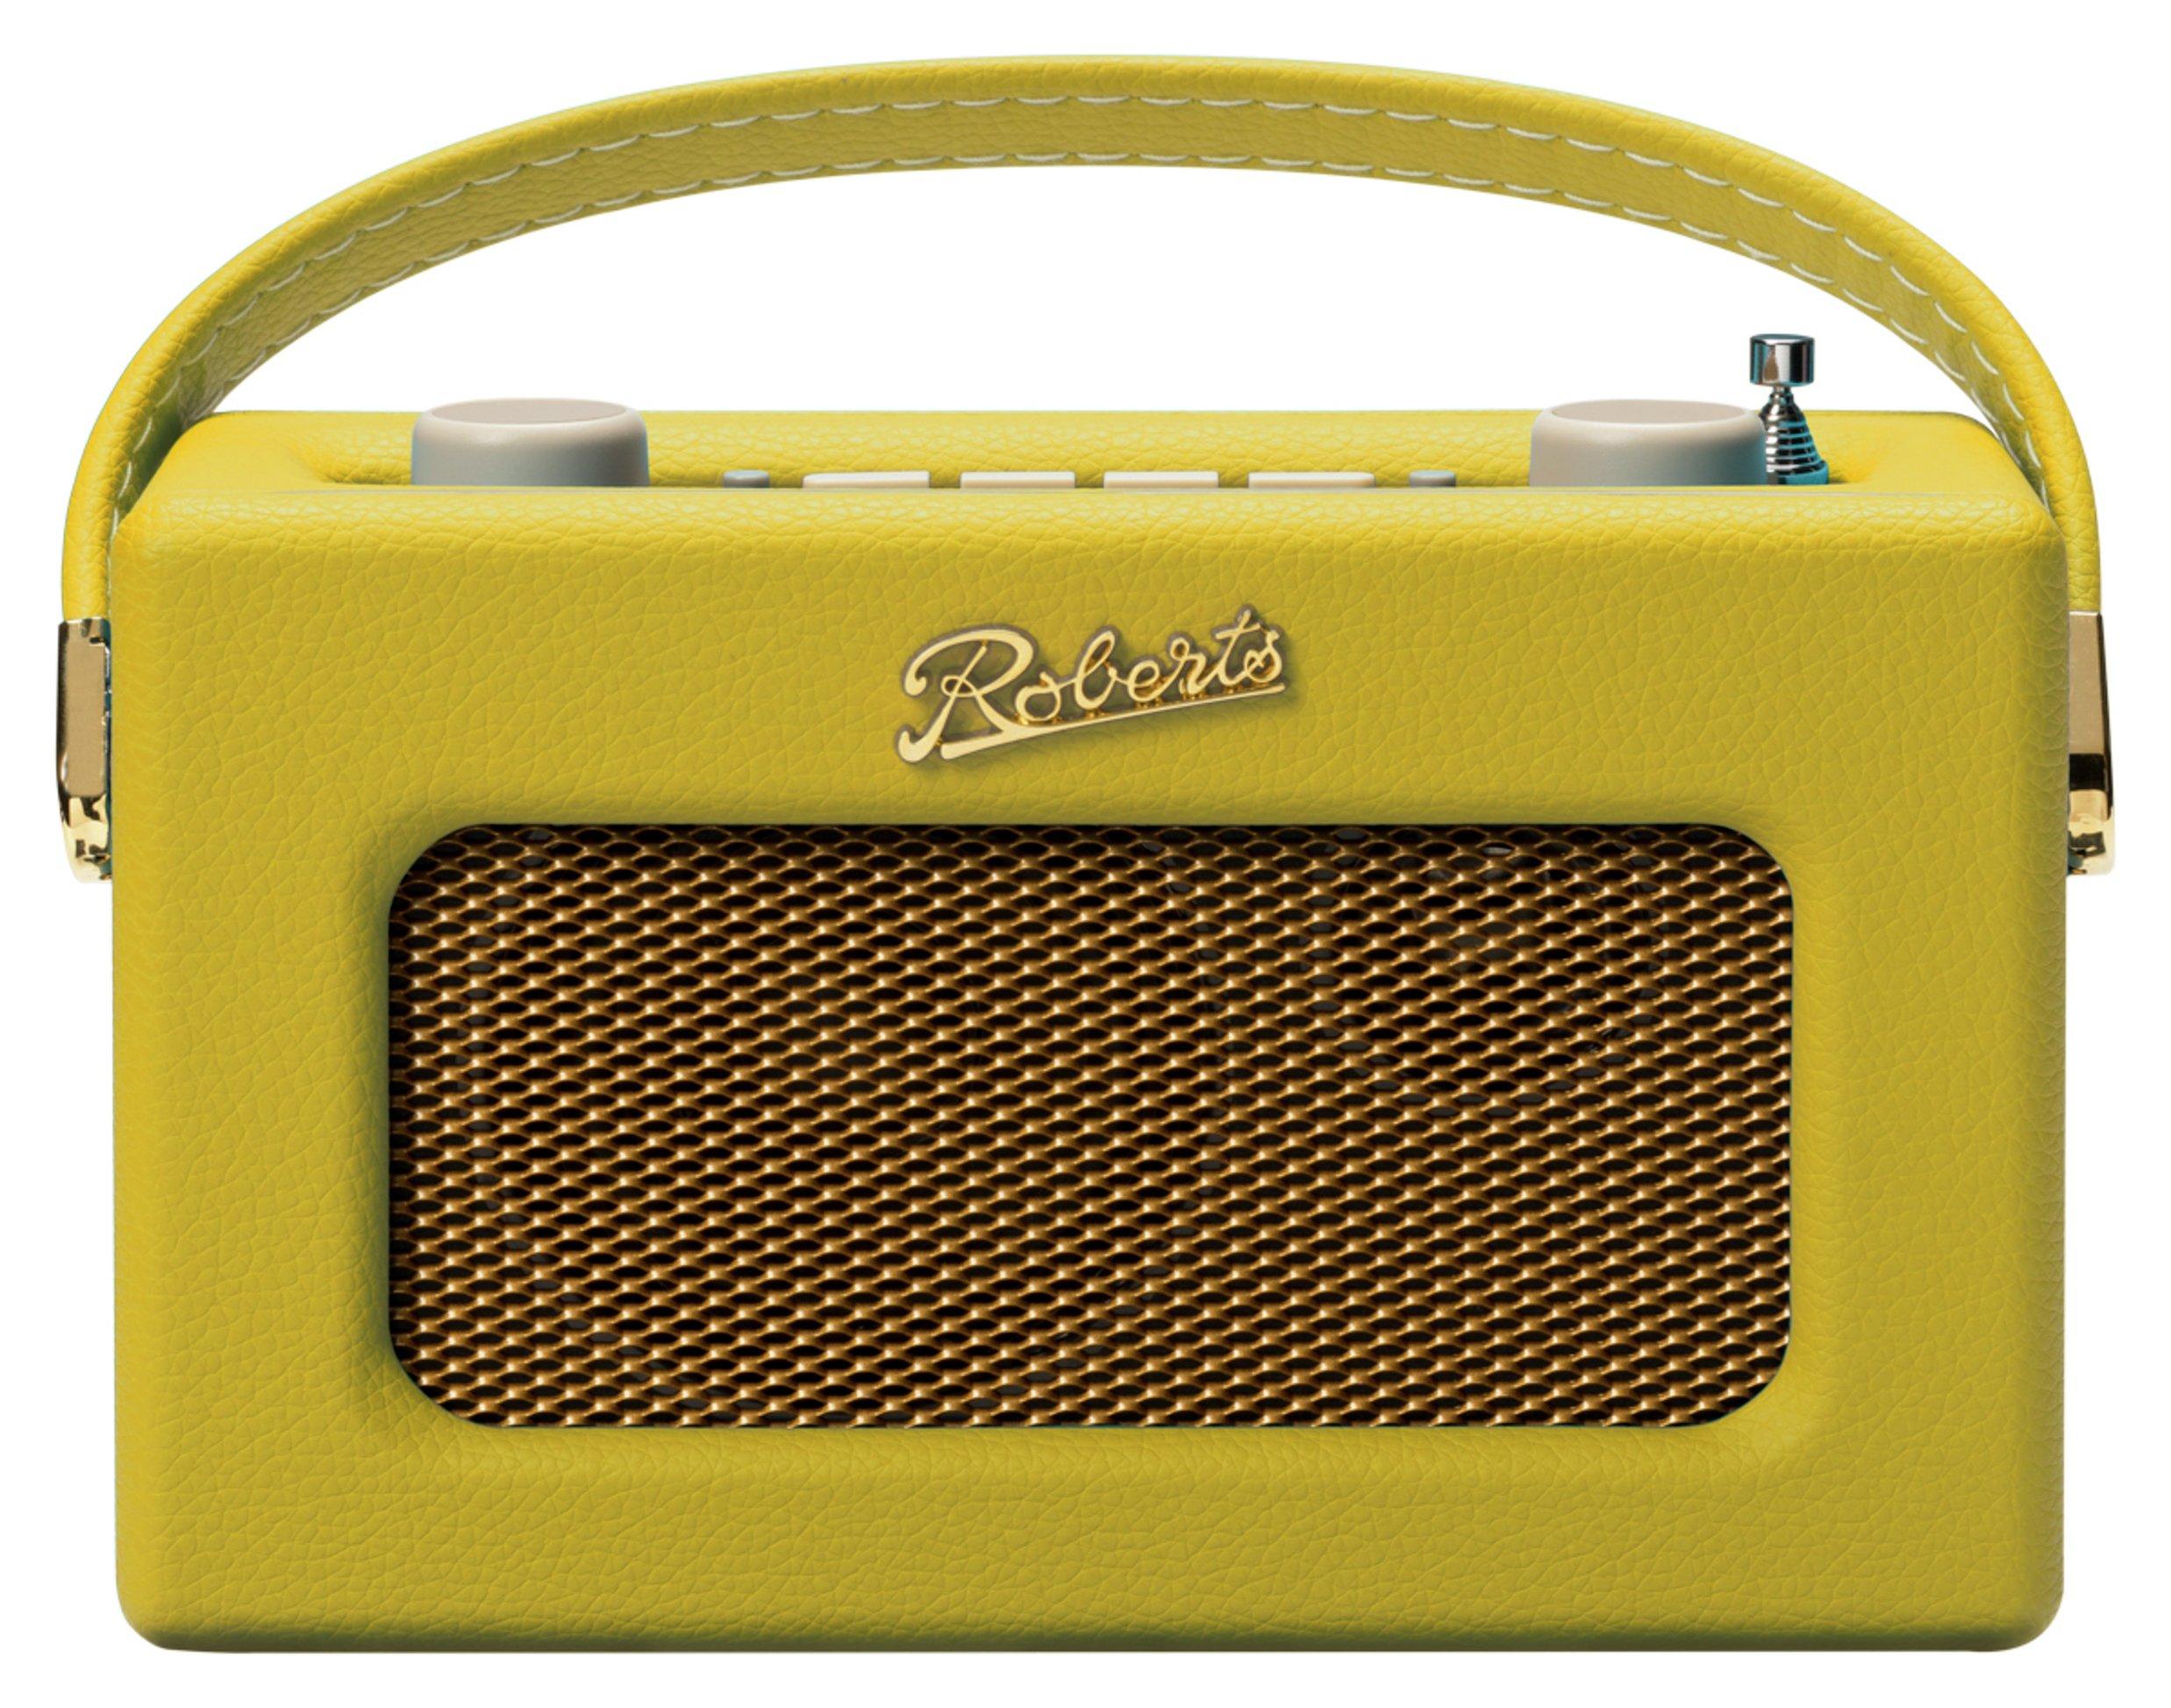 Roberts Revival Uno DAB / DAB+ / FM Radio - Yellow